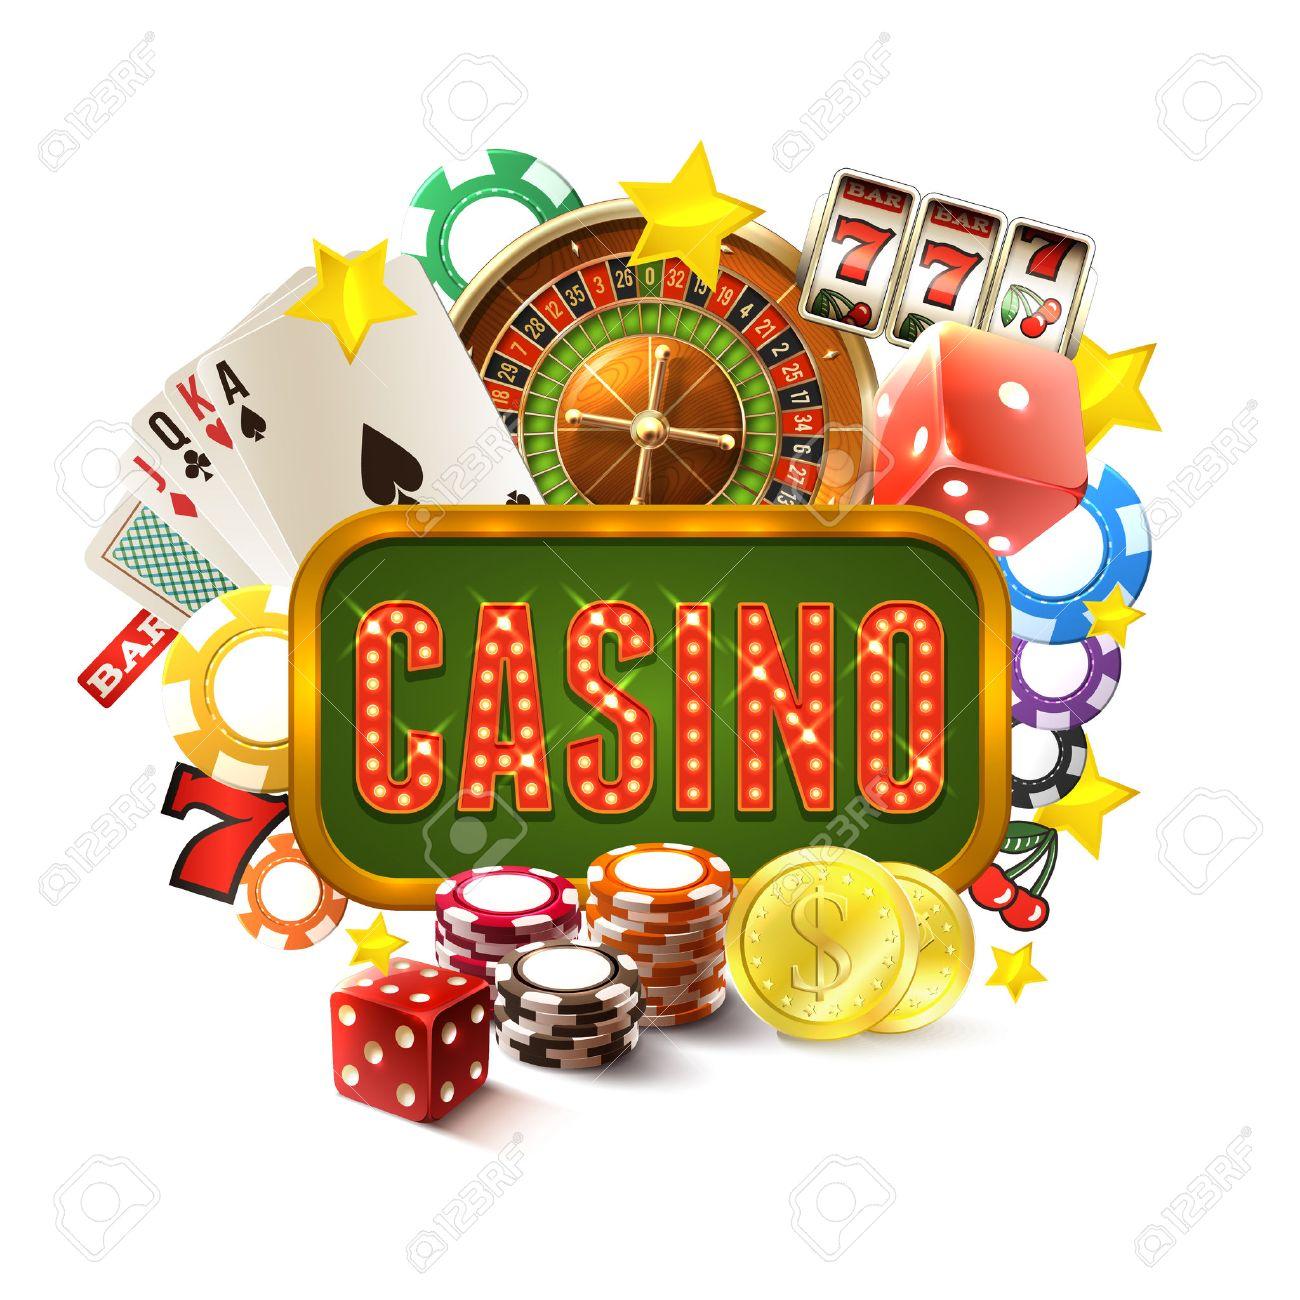 casino canberra australia